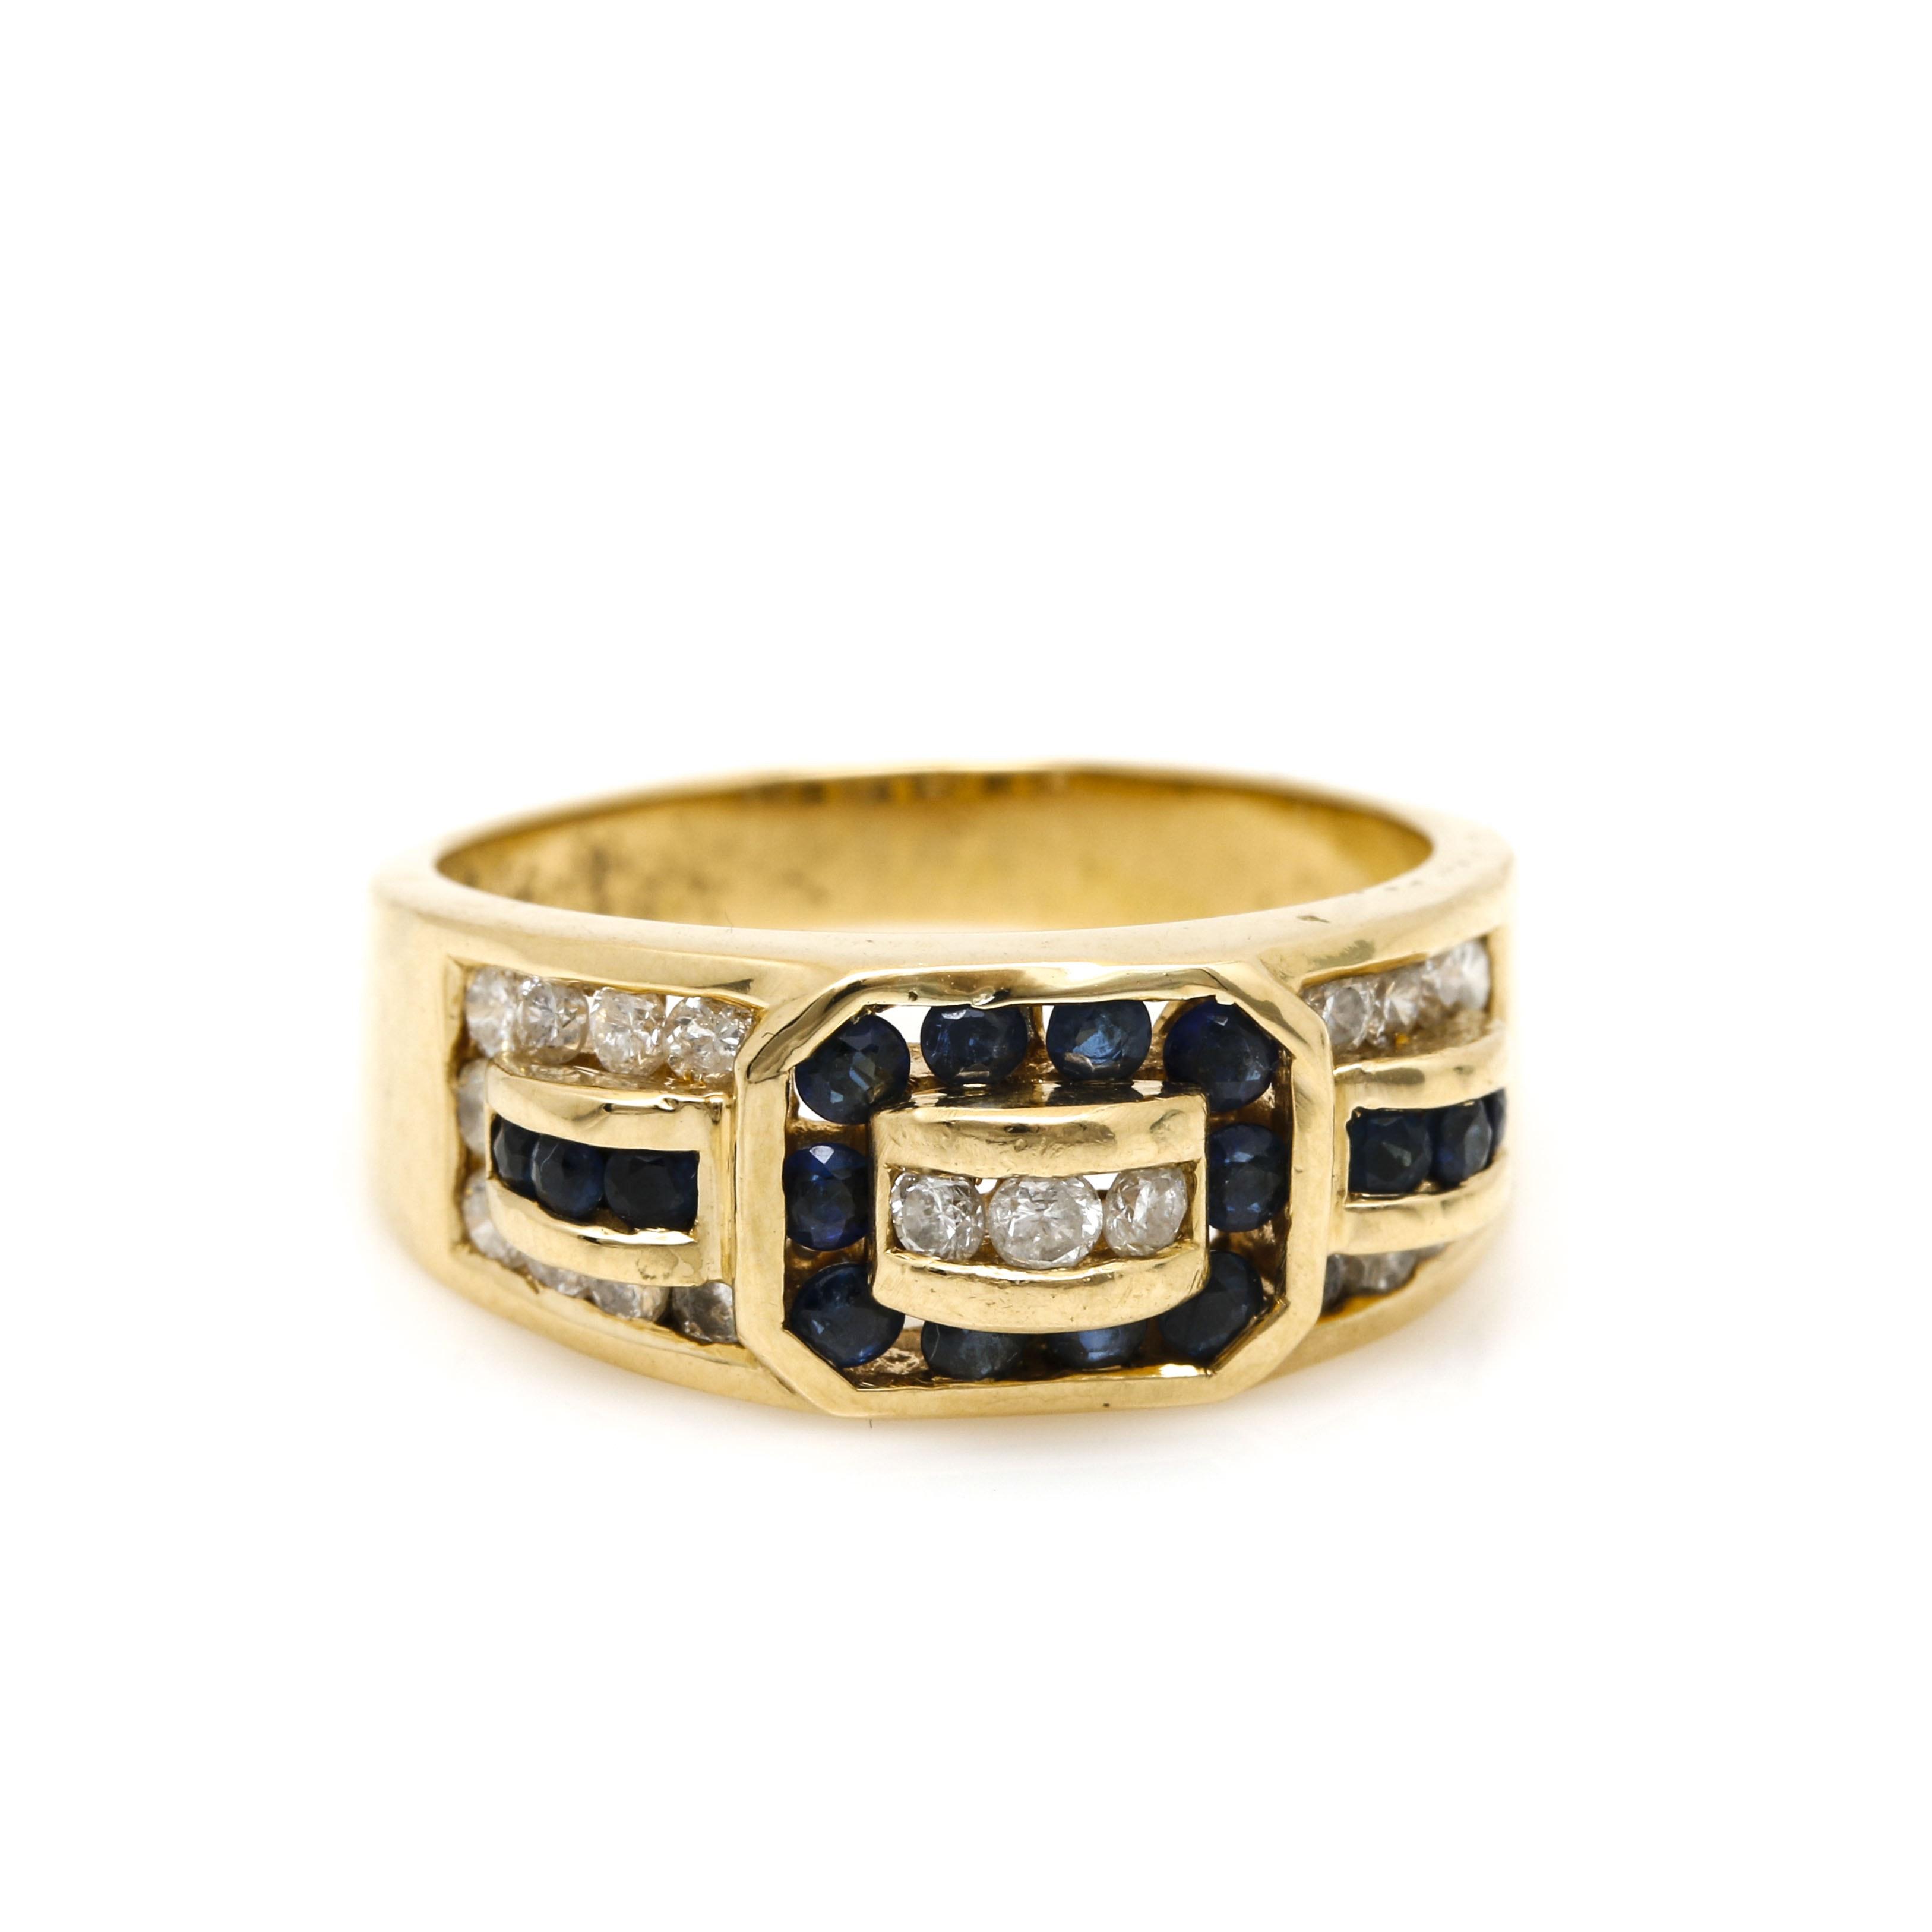 18K Yellow Gold Diamond and Sapphire Ring